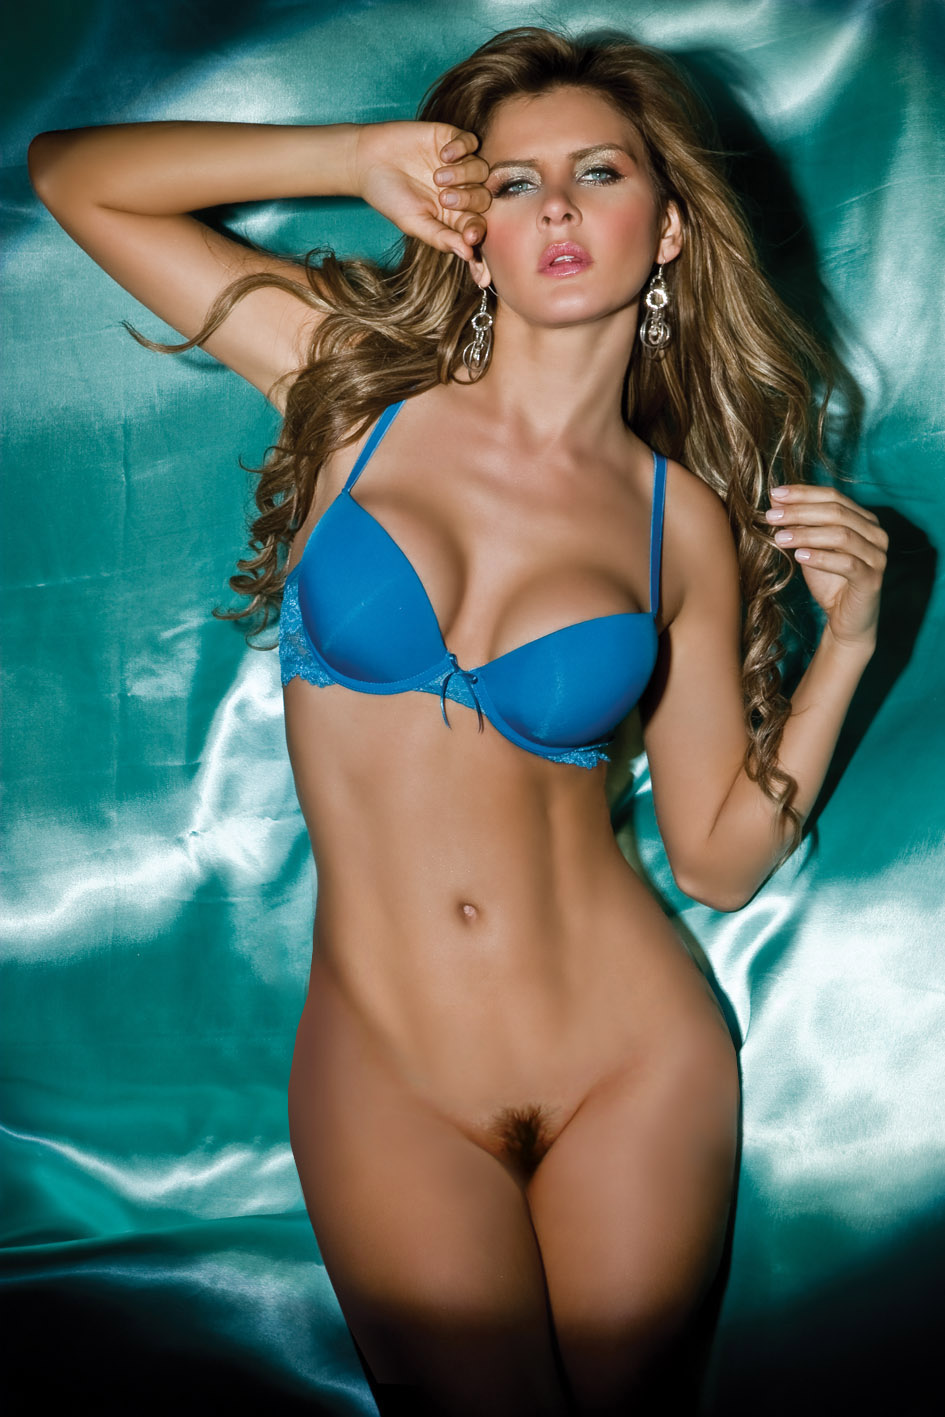 Lorena herrera nude fakes pics 166